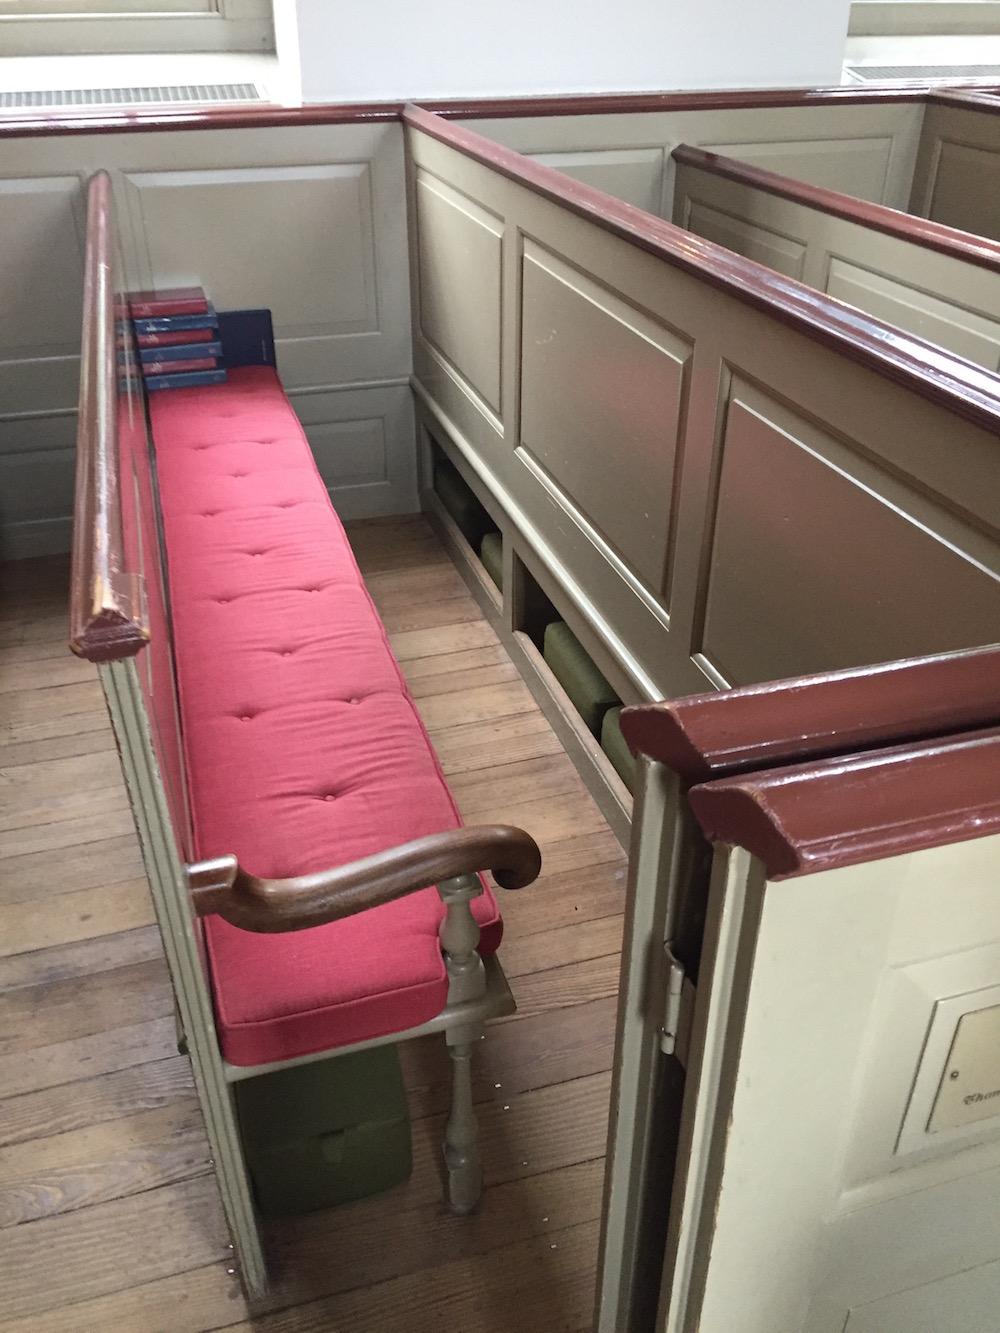 ludwell family pew bruton parish church